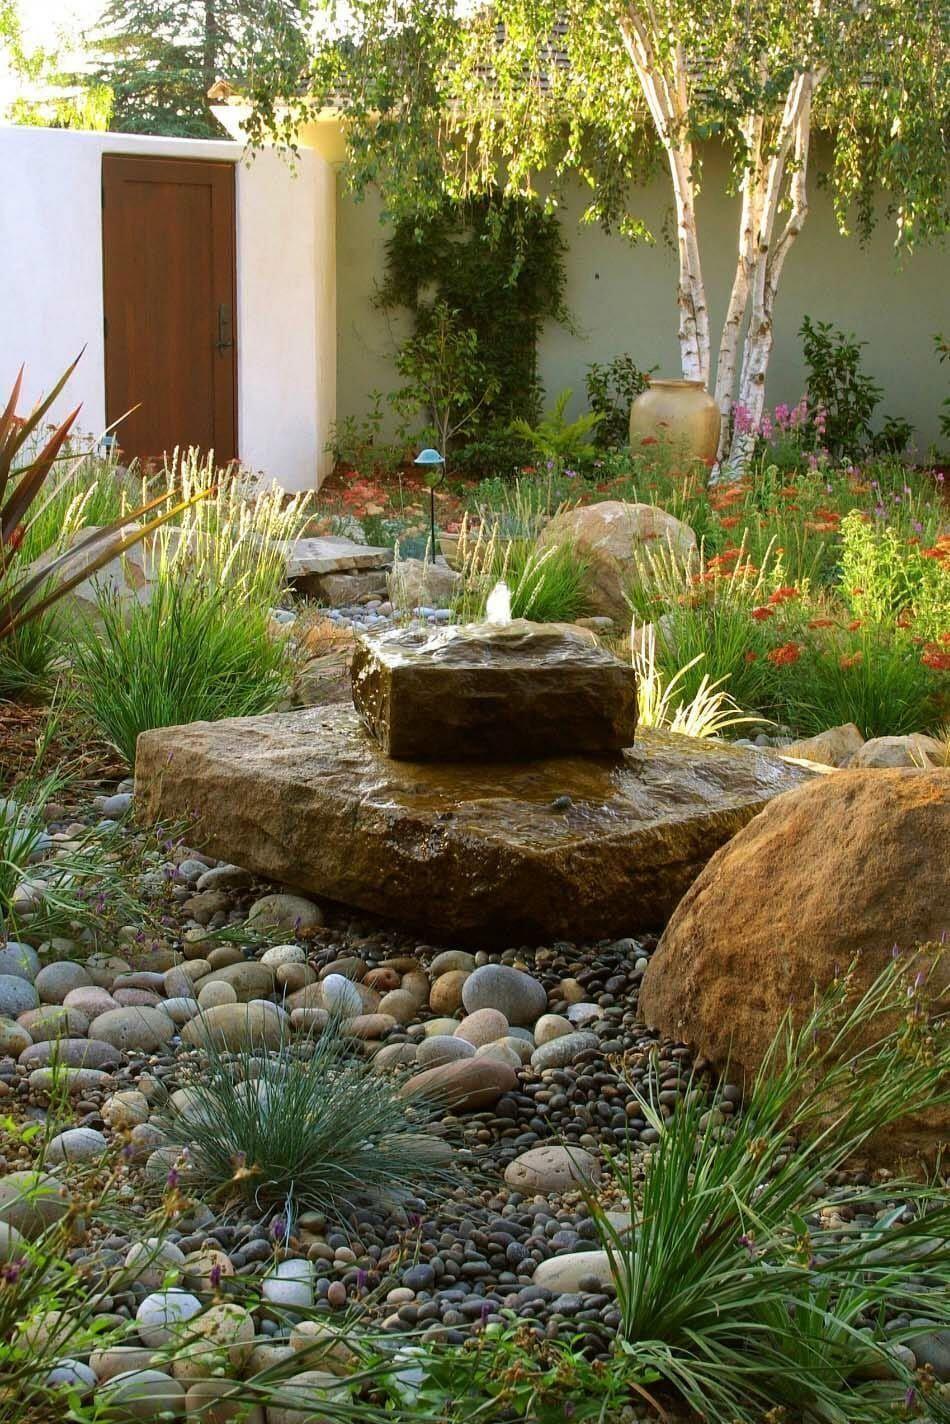 23 inspiring outdoor garden fountains to add tranquility to your landscape gardenfountainsdesign landscapedesigner gardenfountainsstone